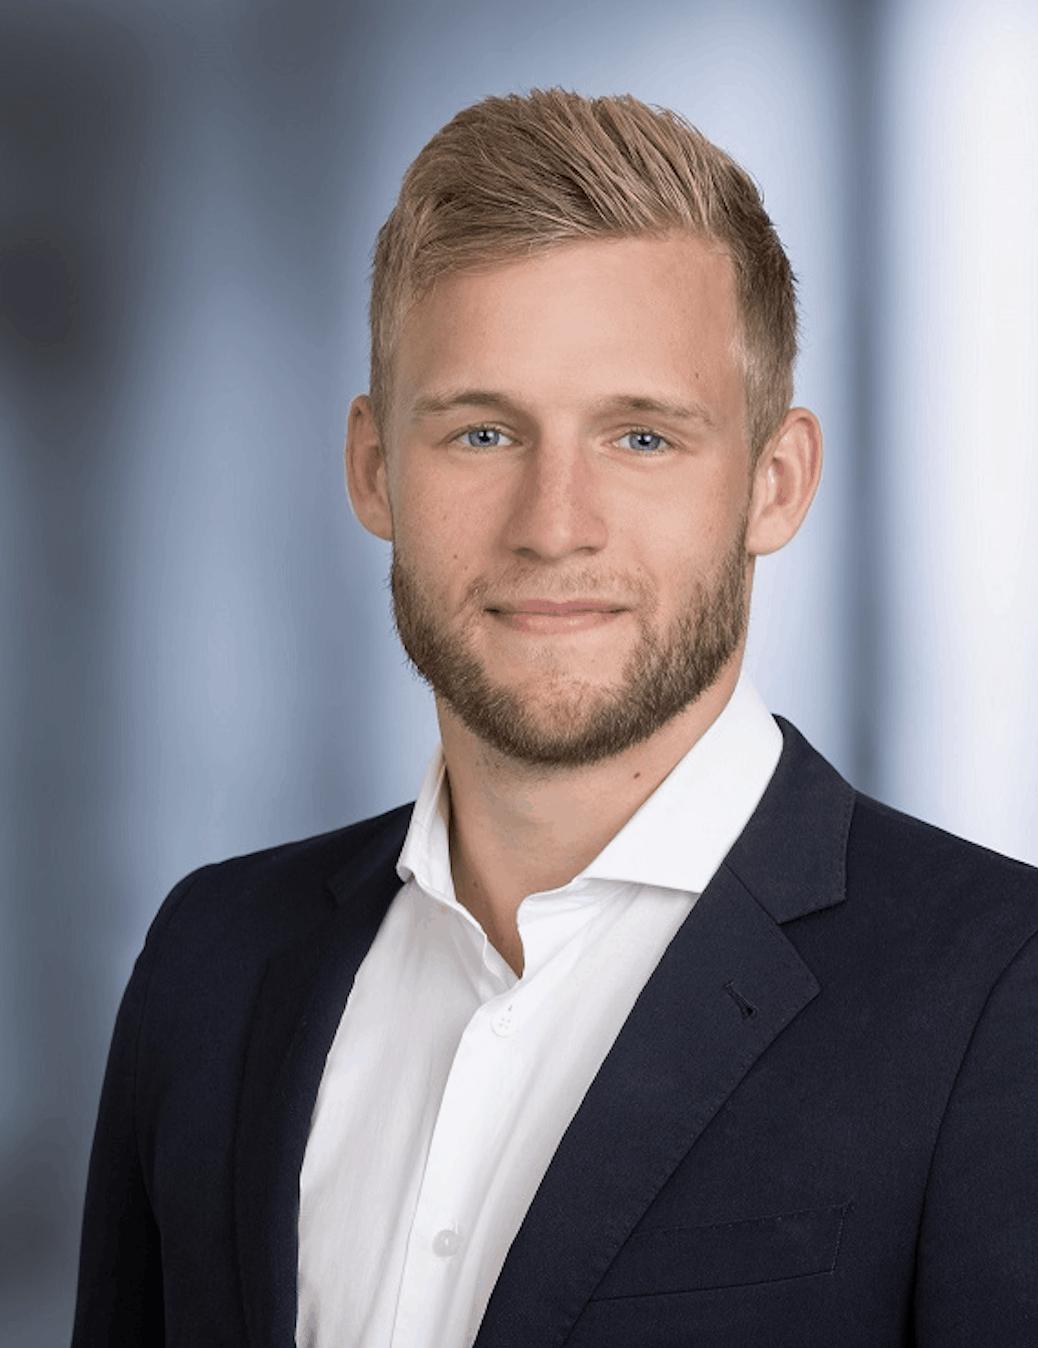 Nico Sonnenberg